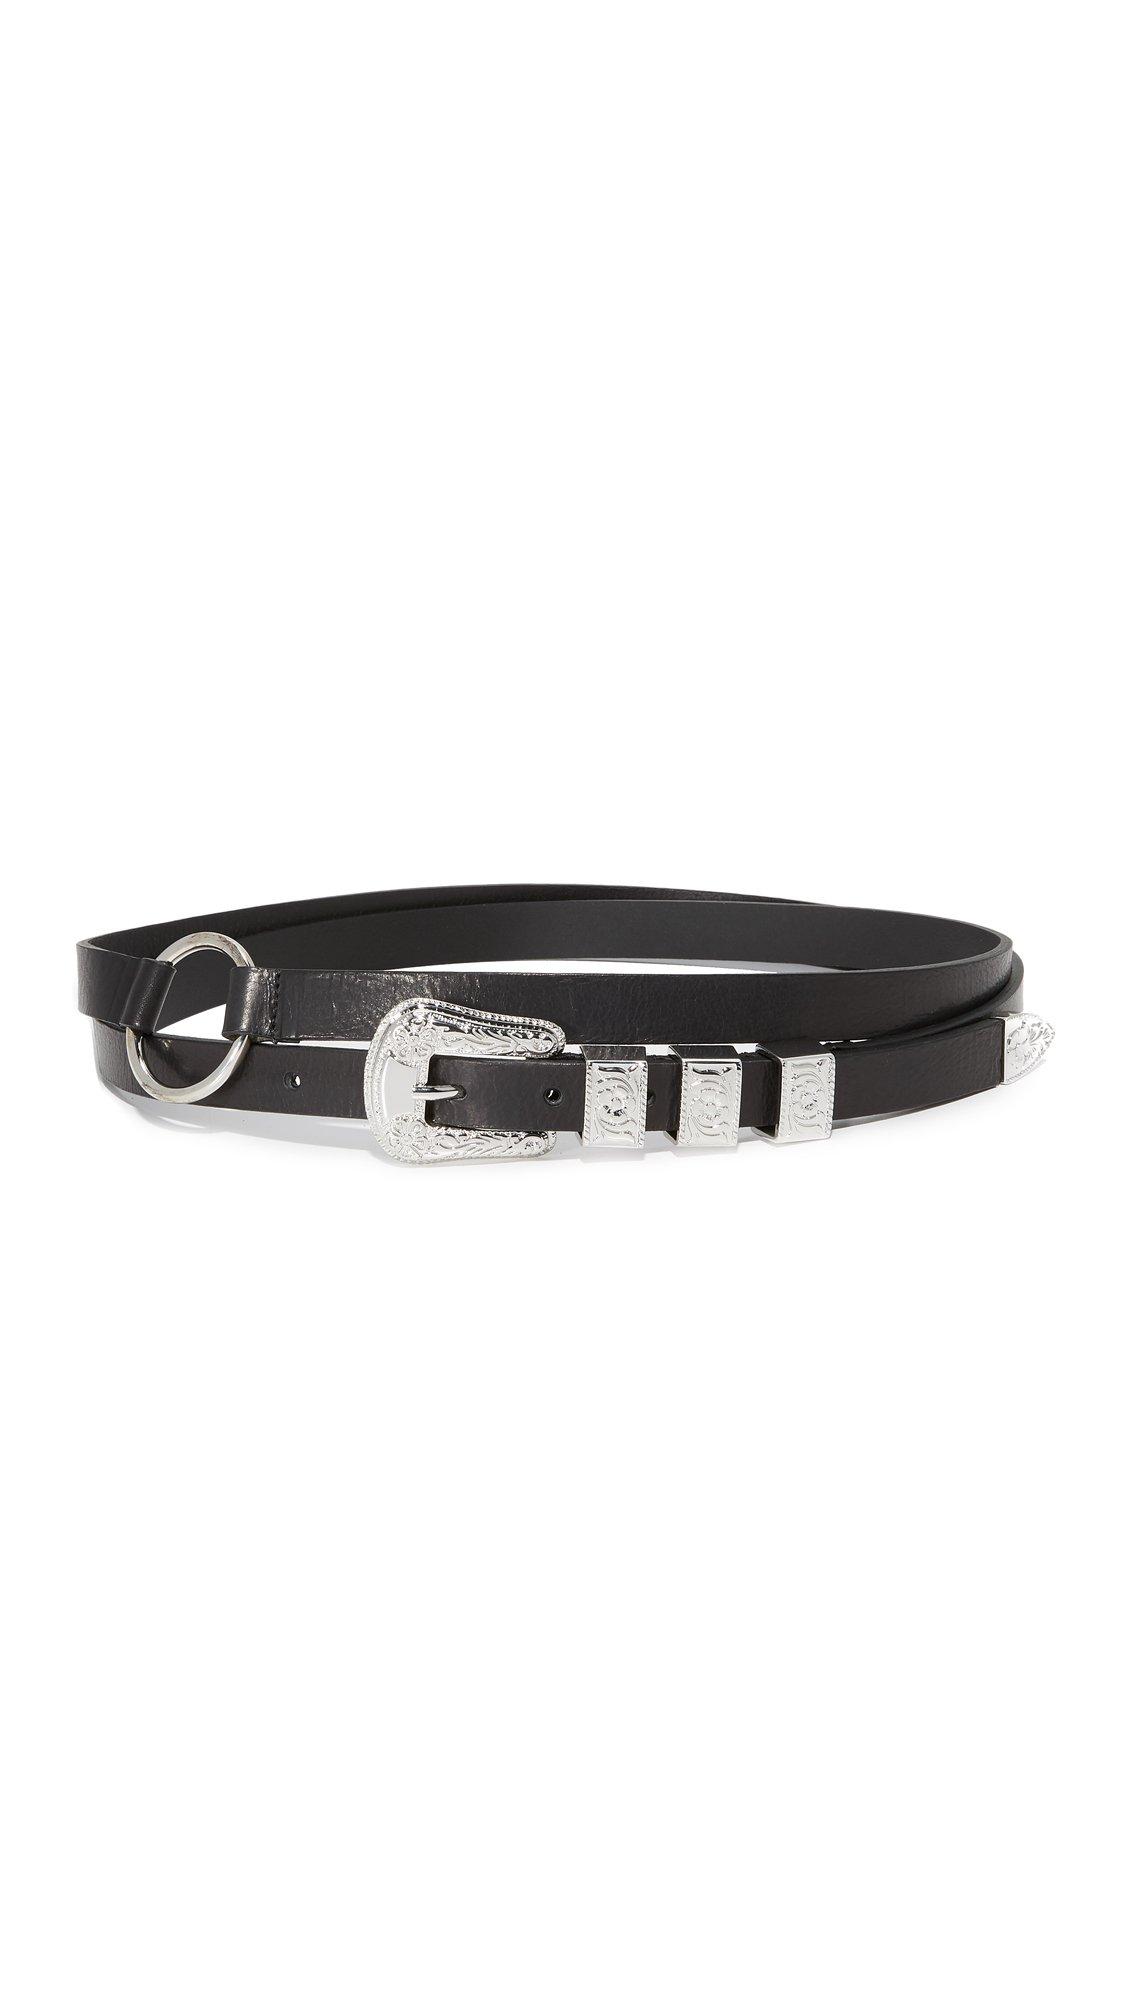 McQ - Alexander McQueen Women's Solstice Double Wrap Belt, Black, Small by McQ Alexander McQueen